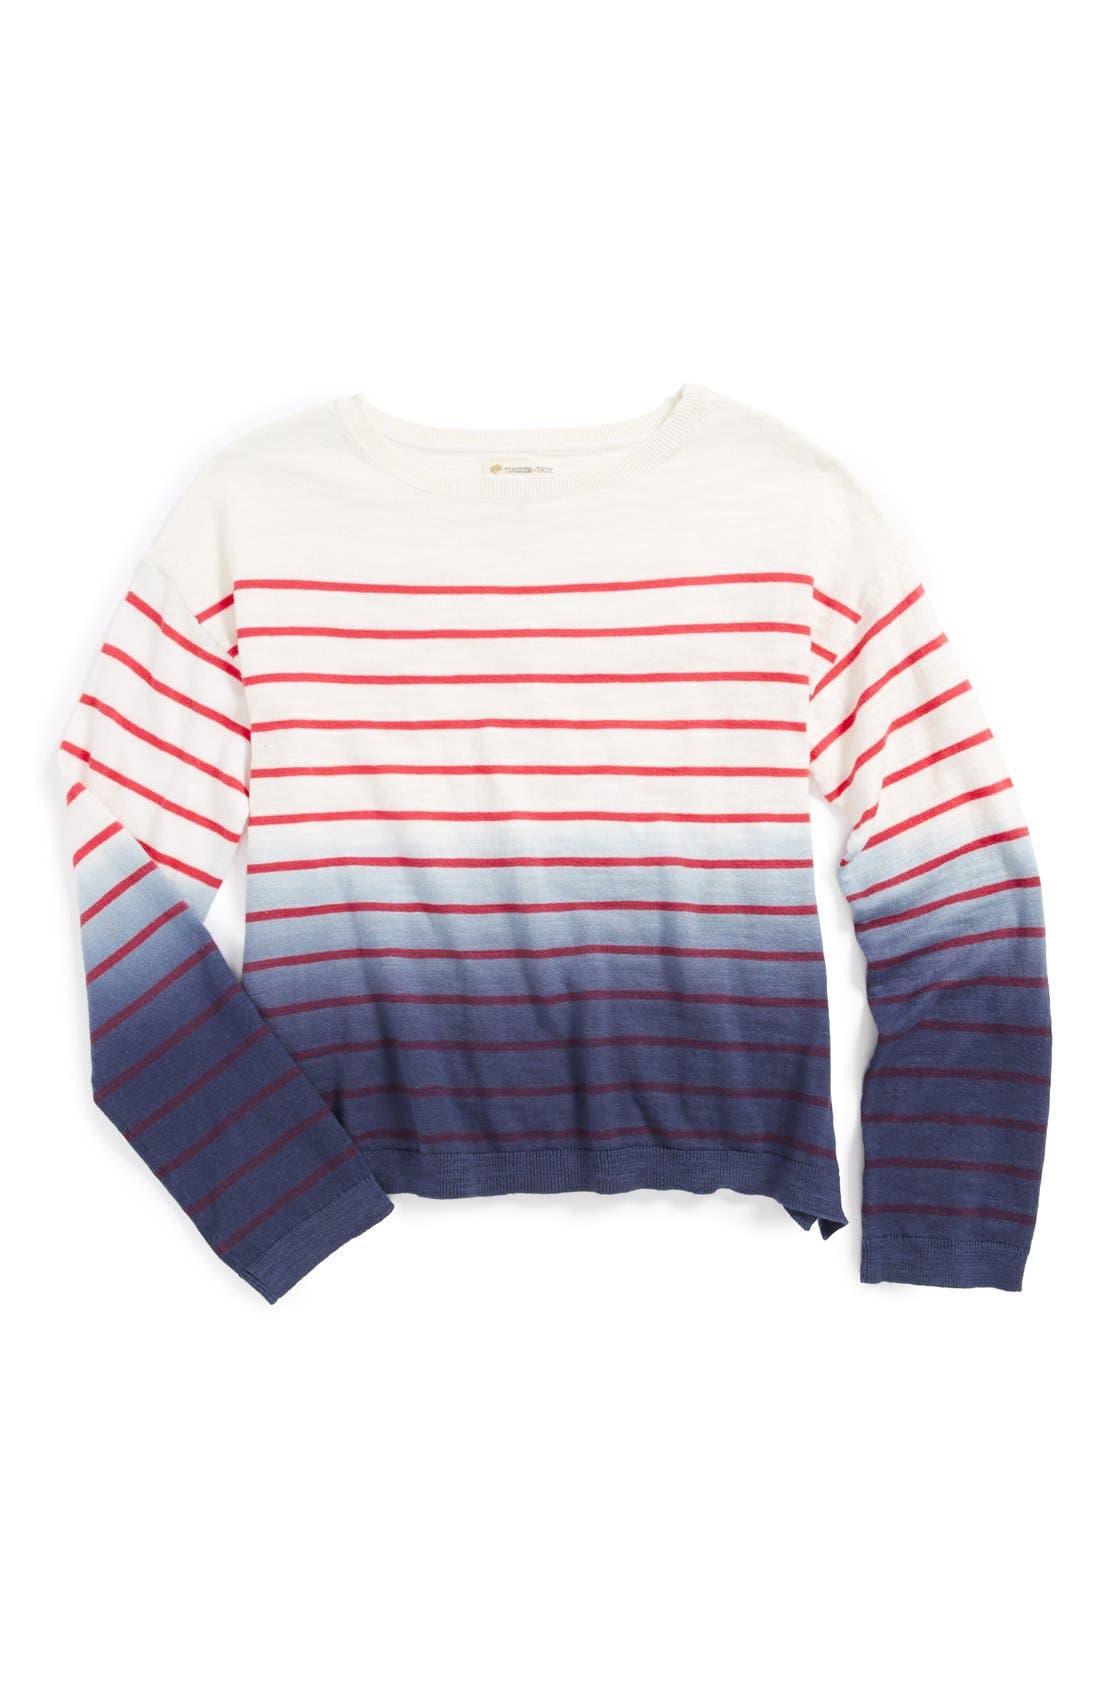 Alternate Image 1 Selected - Tucker + Tate 'Candy' Sweater (Big Girls)